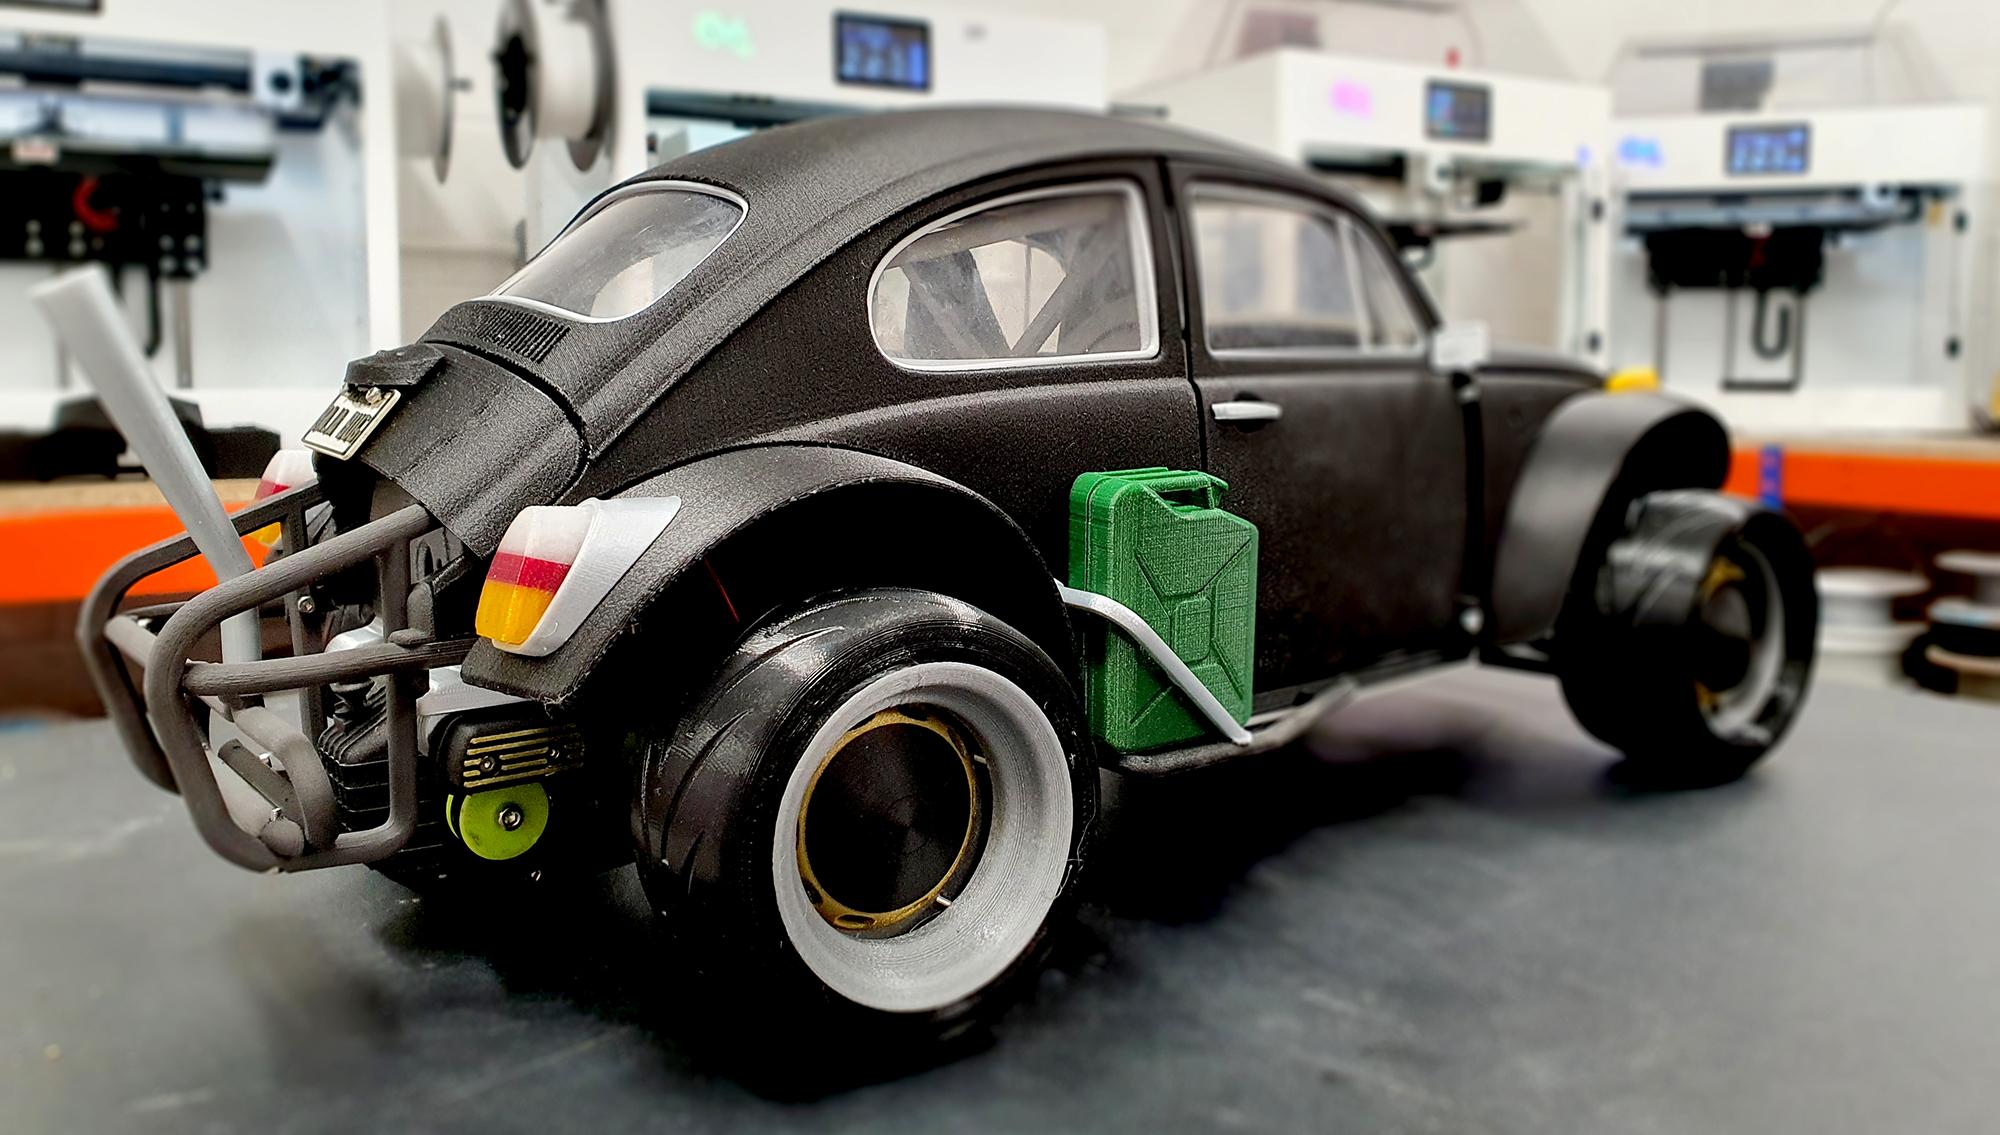 3D Printed Model Buggy